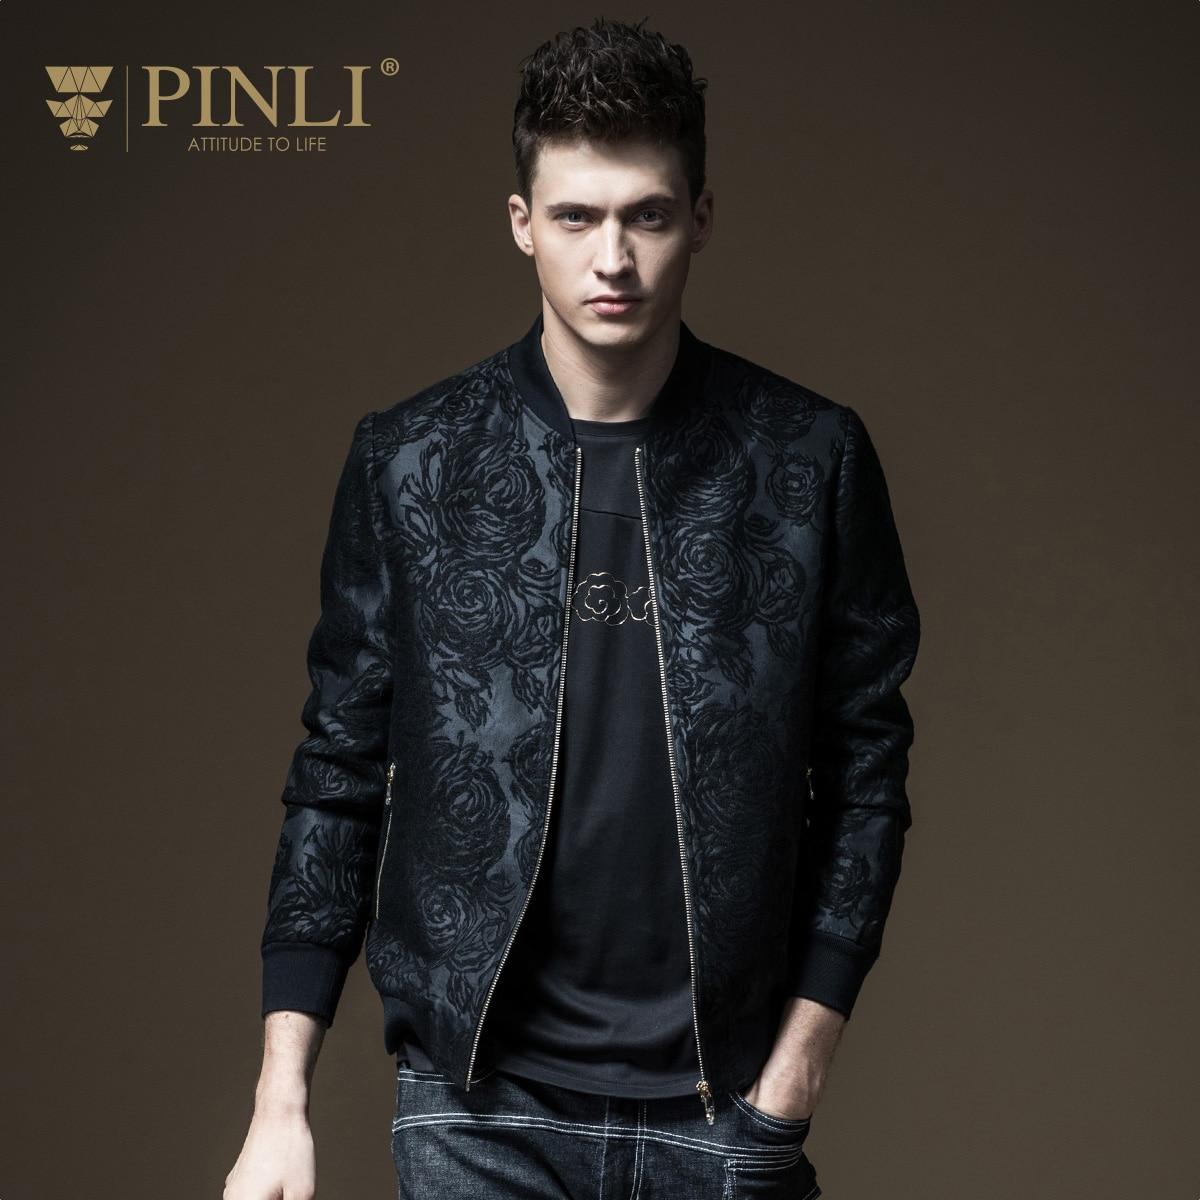 e405f078b2 2019 Casaco Masculino O-neck Slim Military Pinli, 2017, Fall New Menswear,  Jacquard Jacket, Coat, Men's Clothing, B173104027